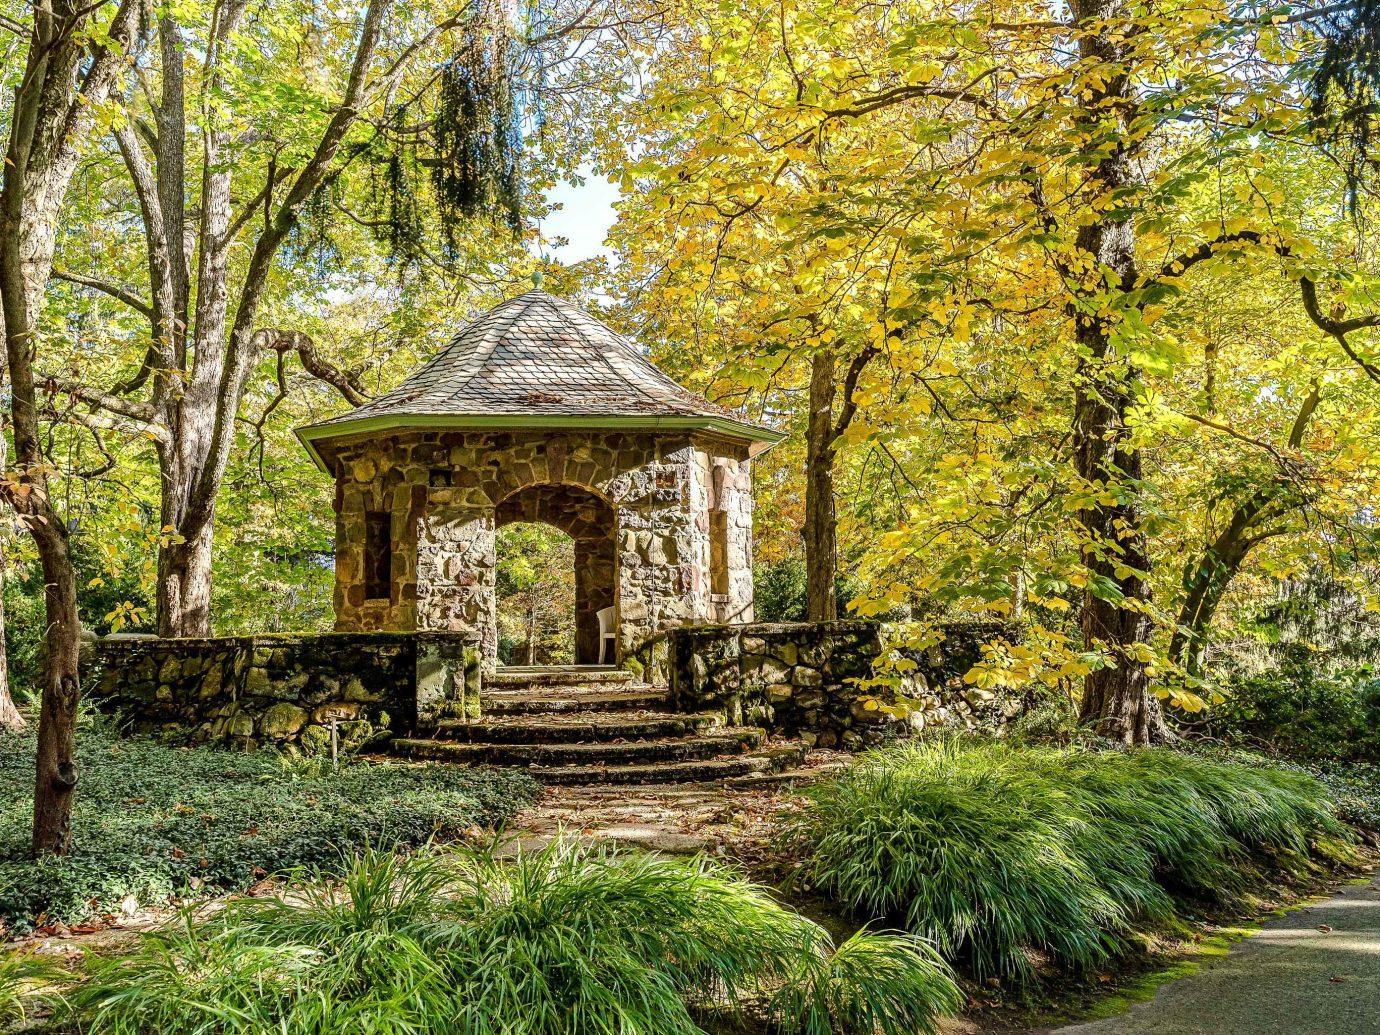 Greenwood Gardens, New Jersey